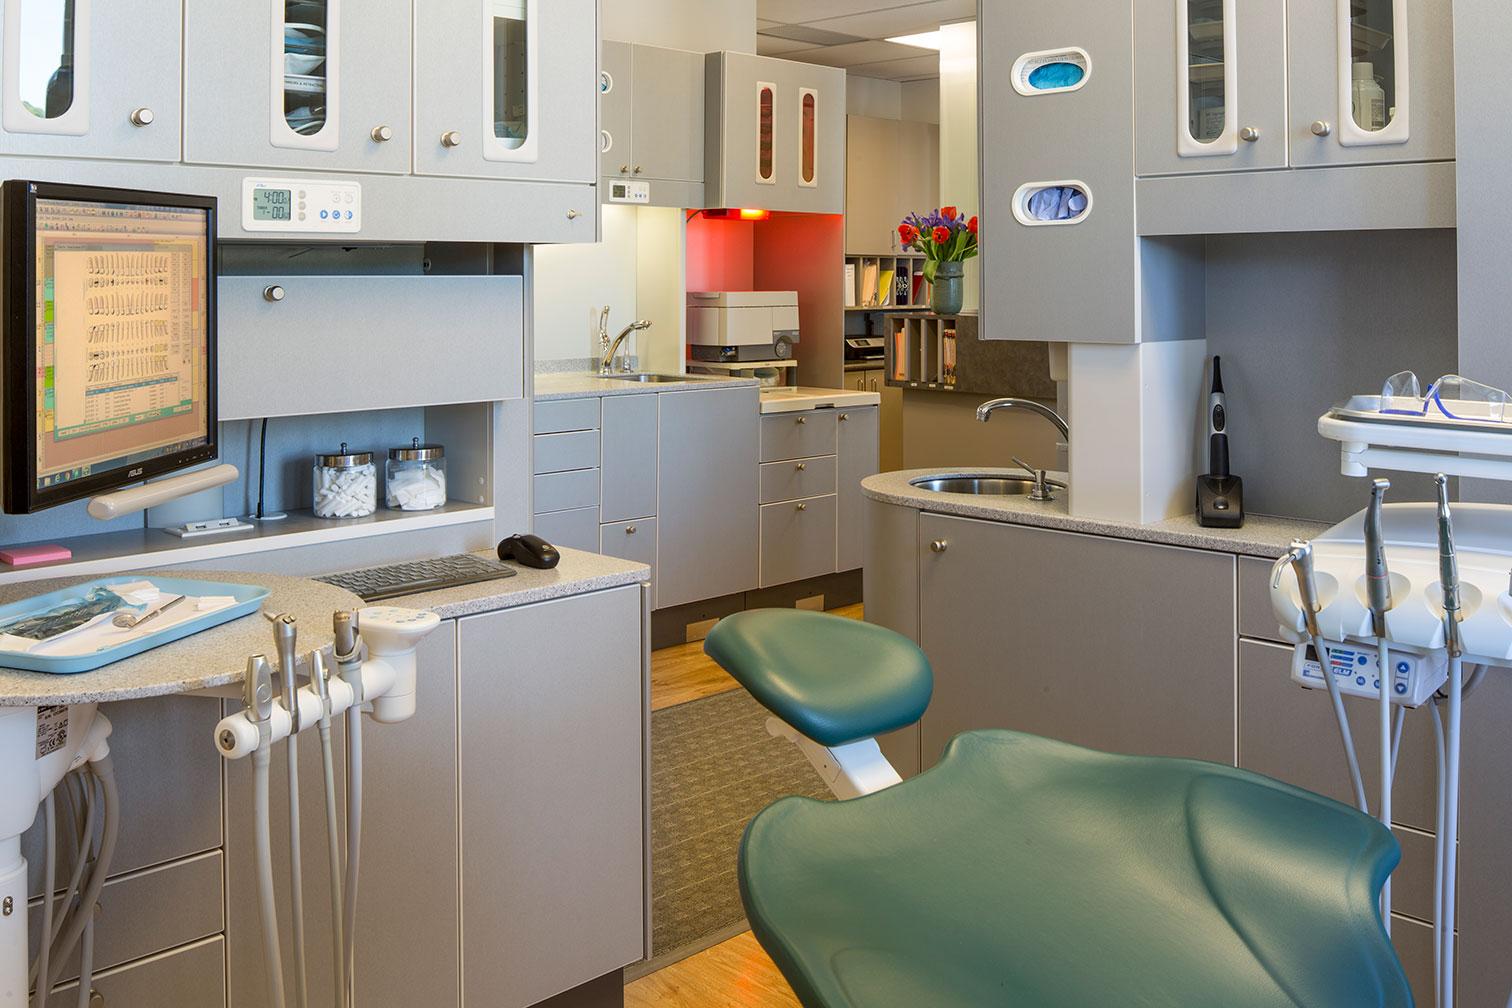 Dentist Office Examination Room, Hallway and Lobby